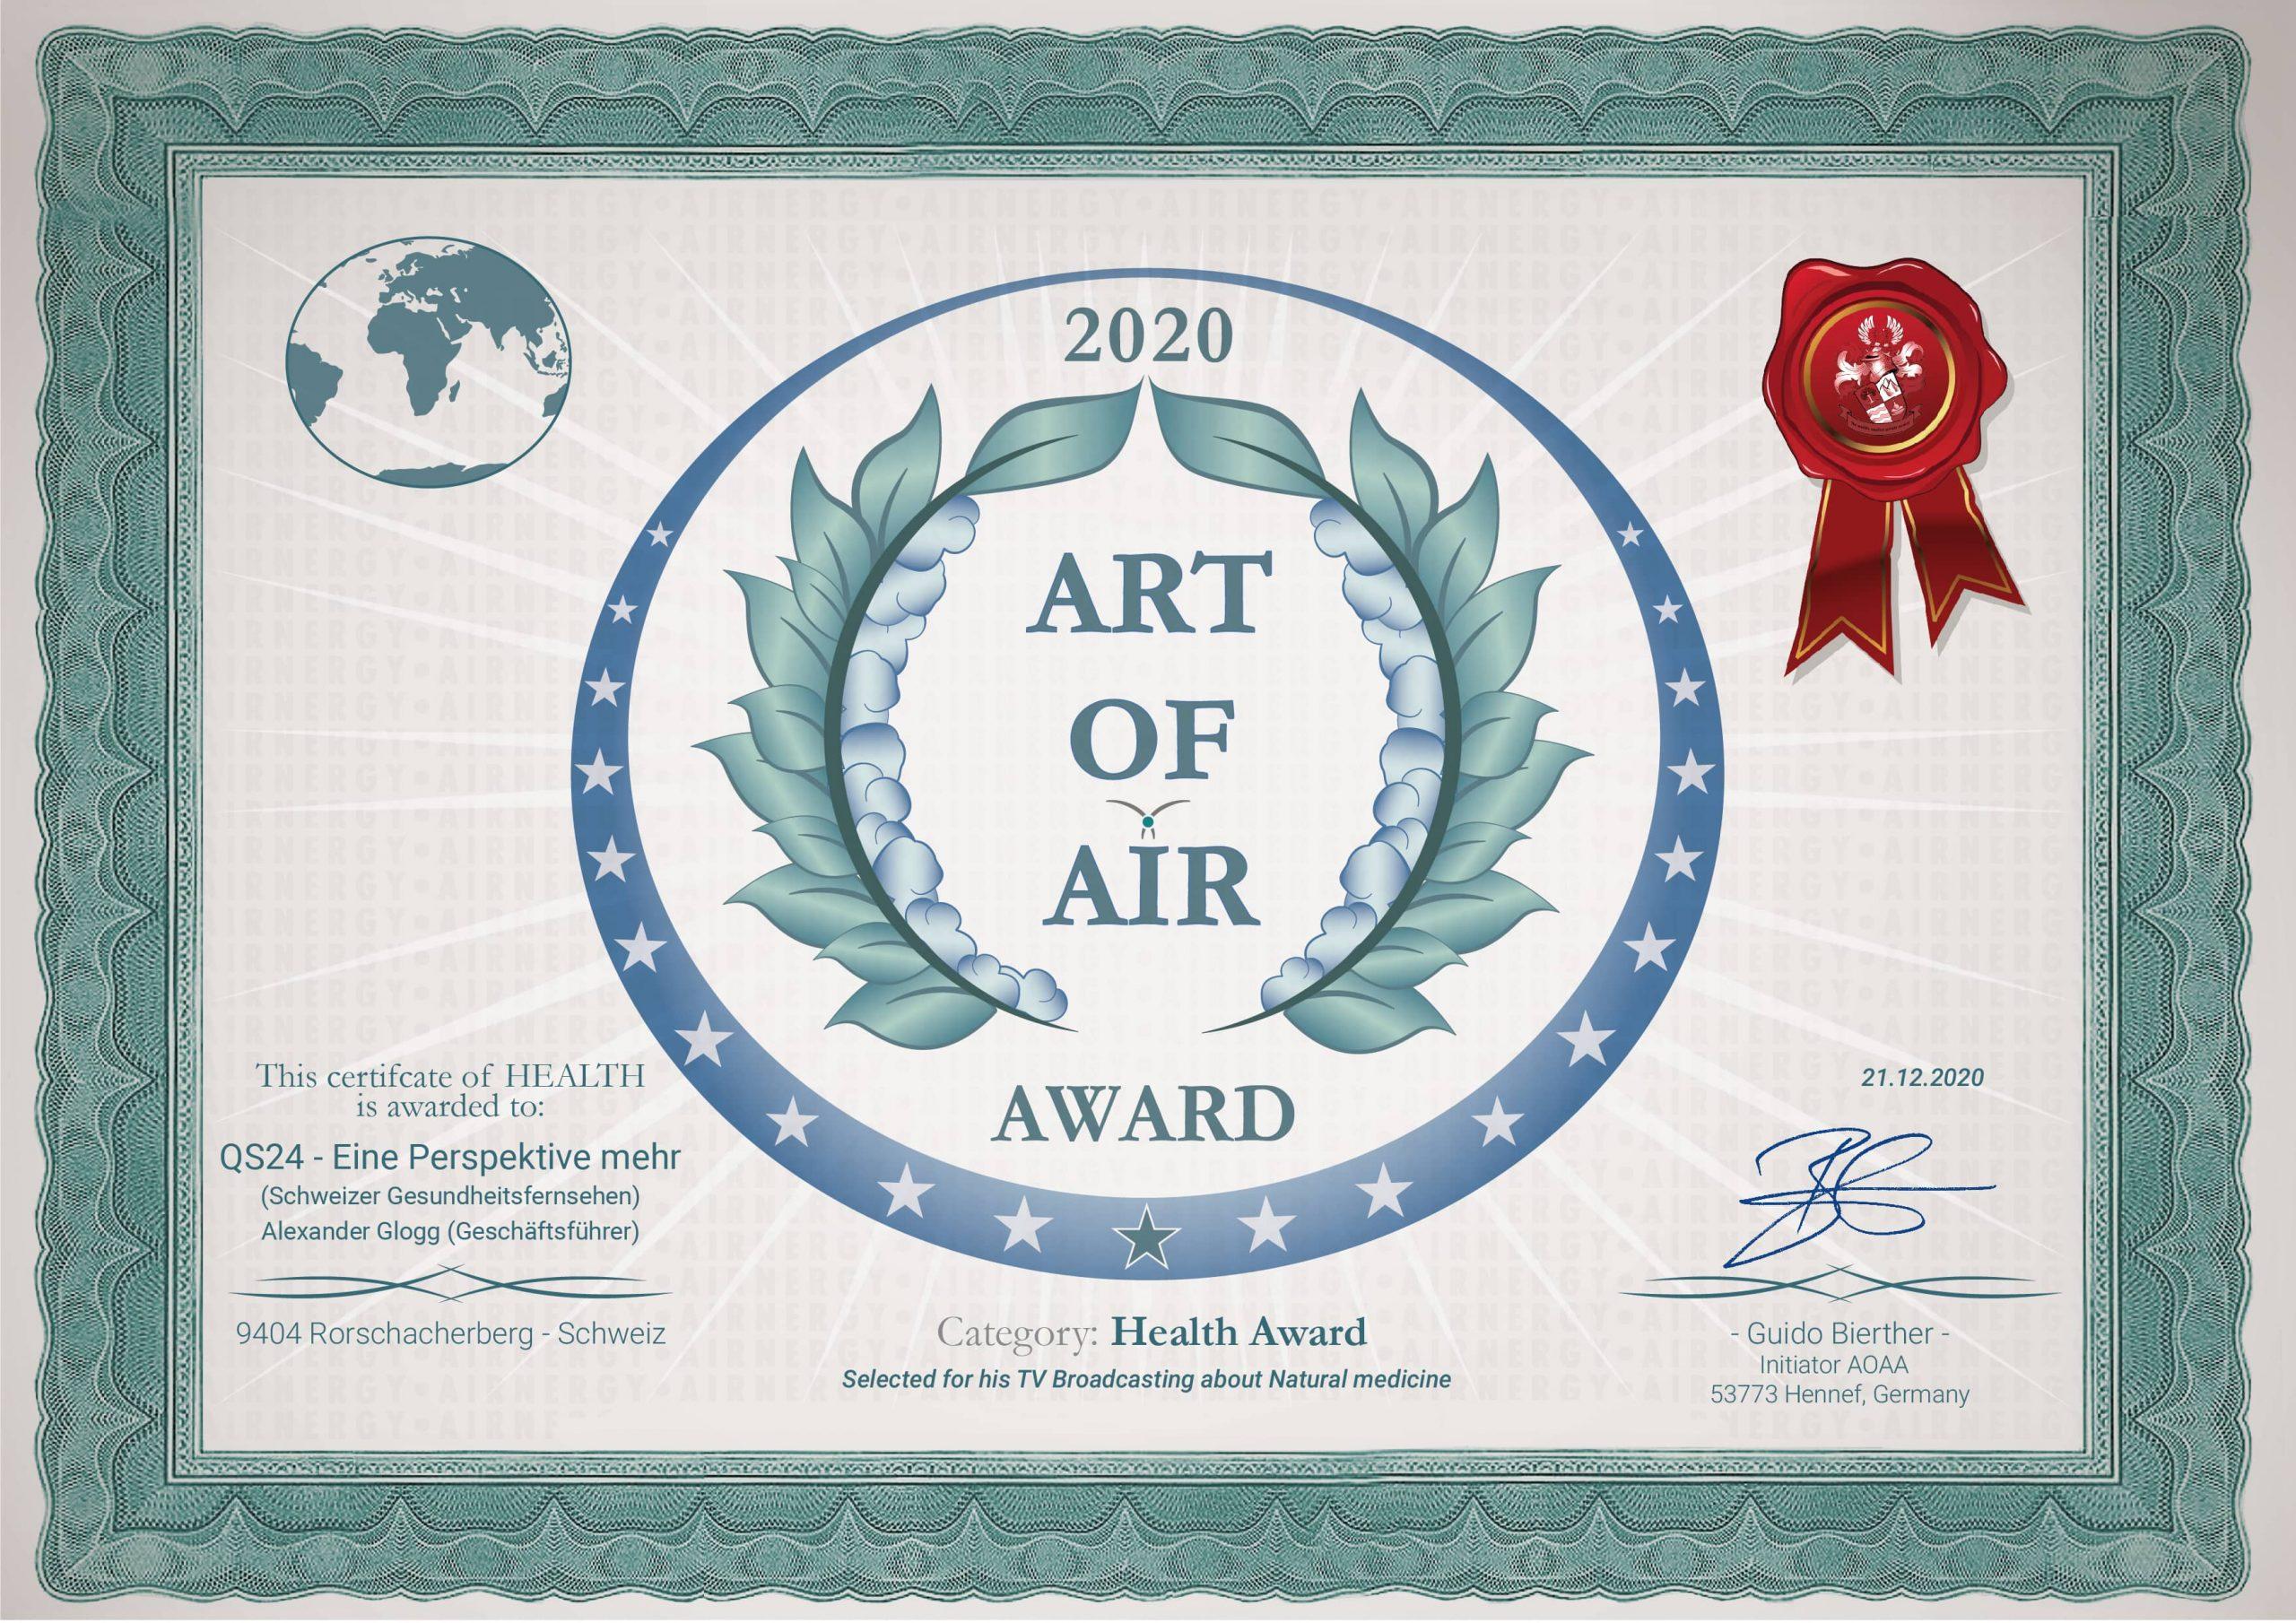 Health Award